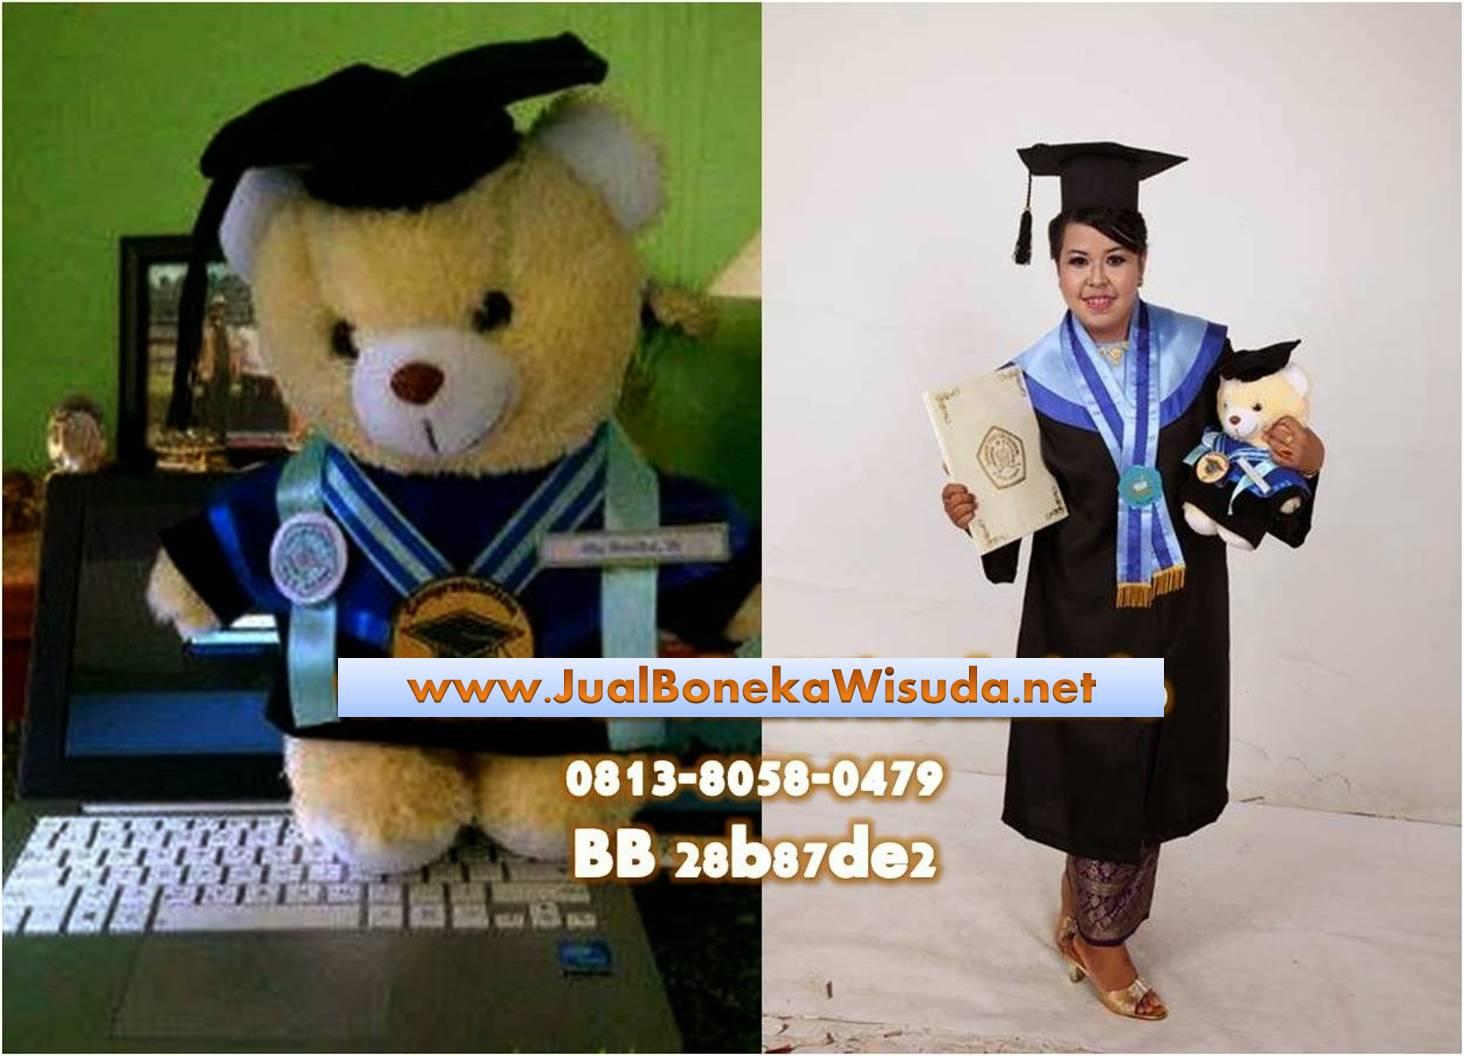 BONEKA WISUDA BANDUNG - 0813-8058-0479 WA CALL - Boneka Wisuda 303800fe59